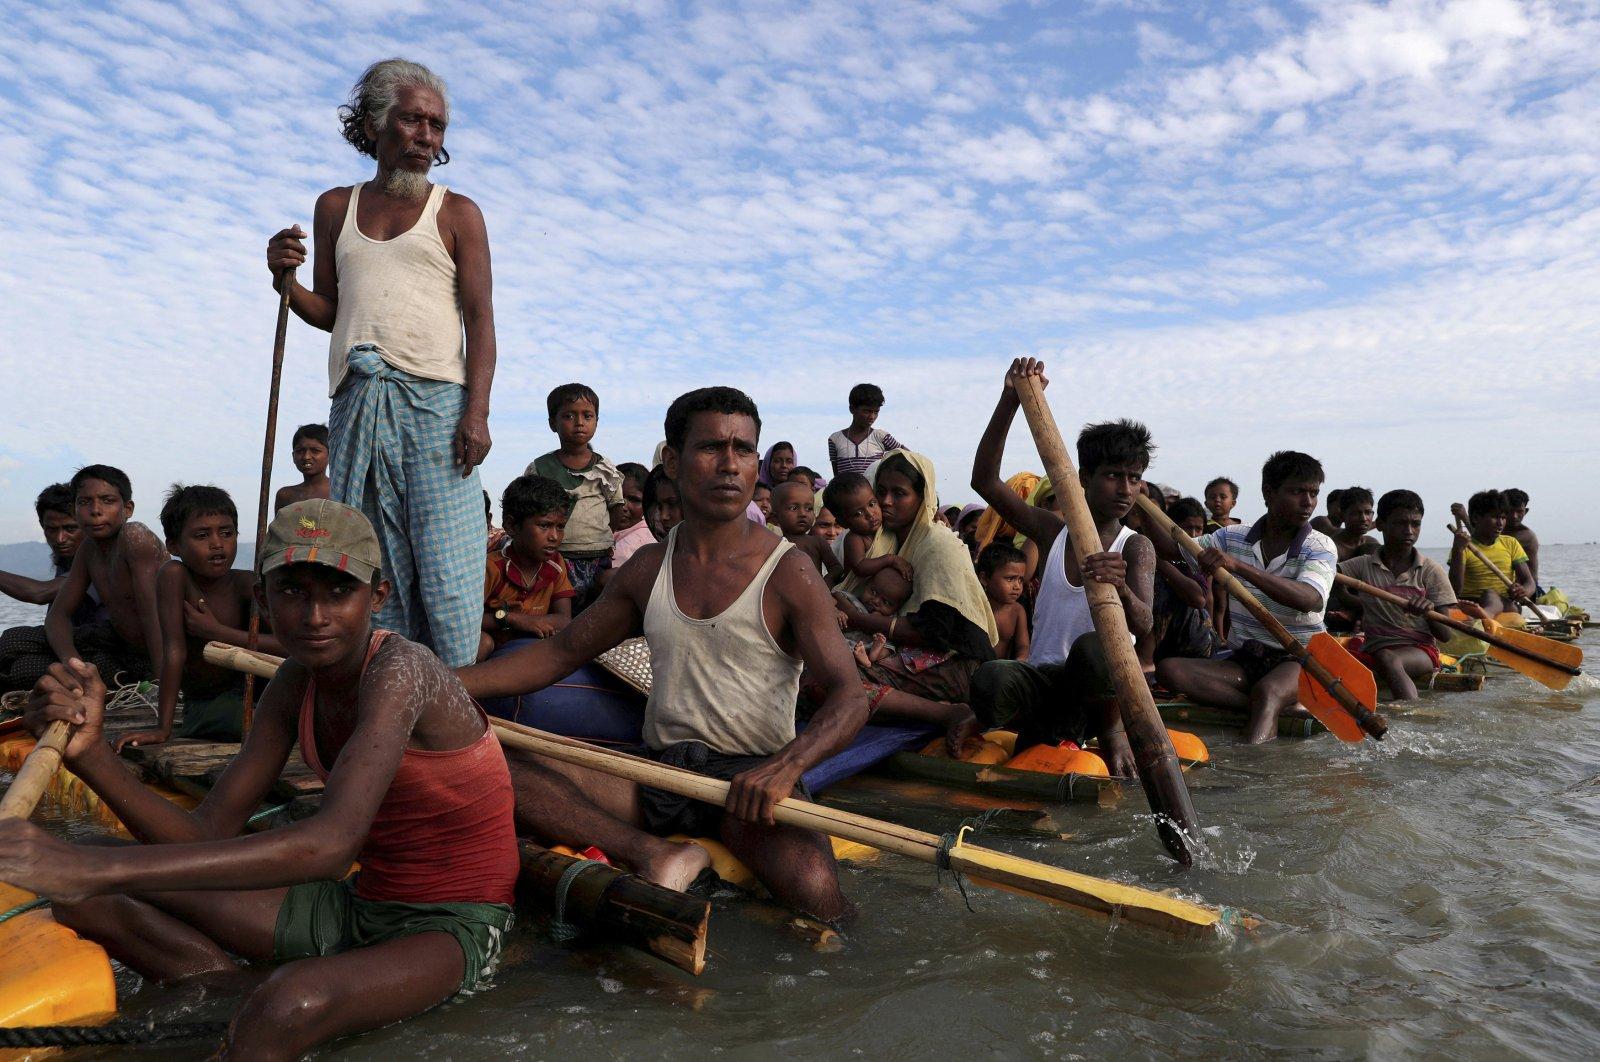 Rohingya refugees cross the Naf River with an improvised raft to reach to Bangladesh in Teknaf, Bangladesh, November 12, 2017. (Reuters Photo)